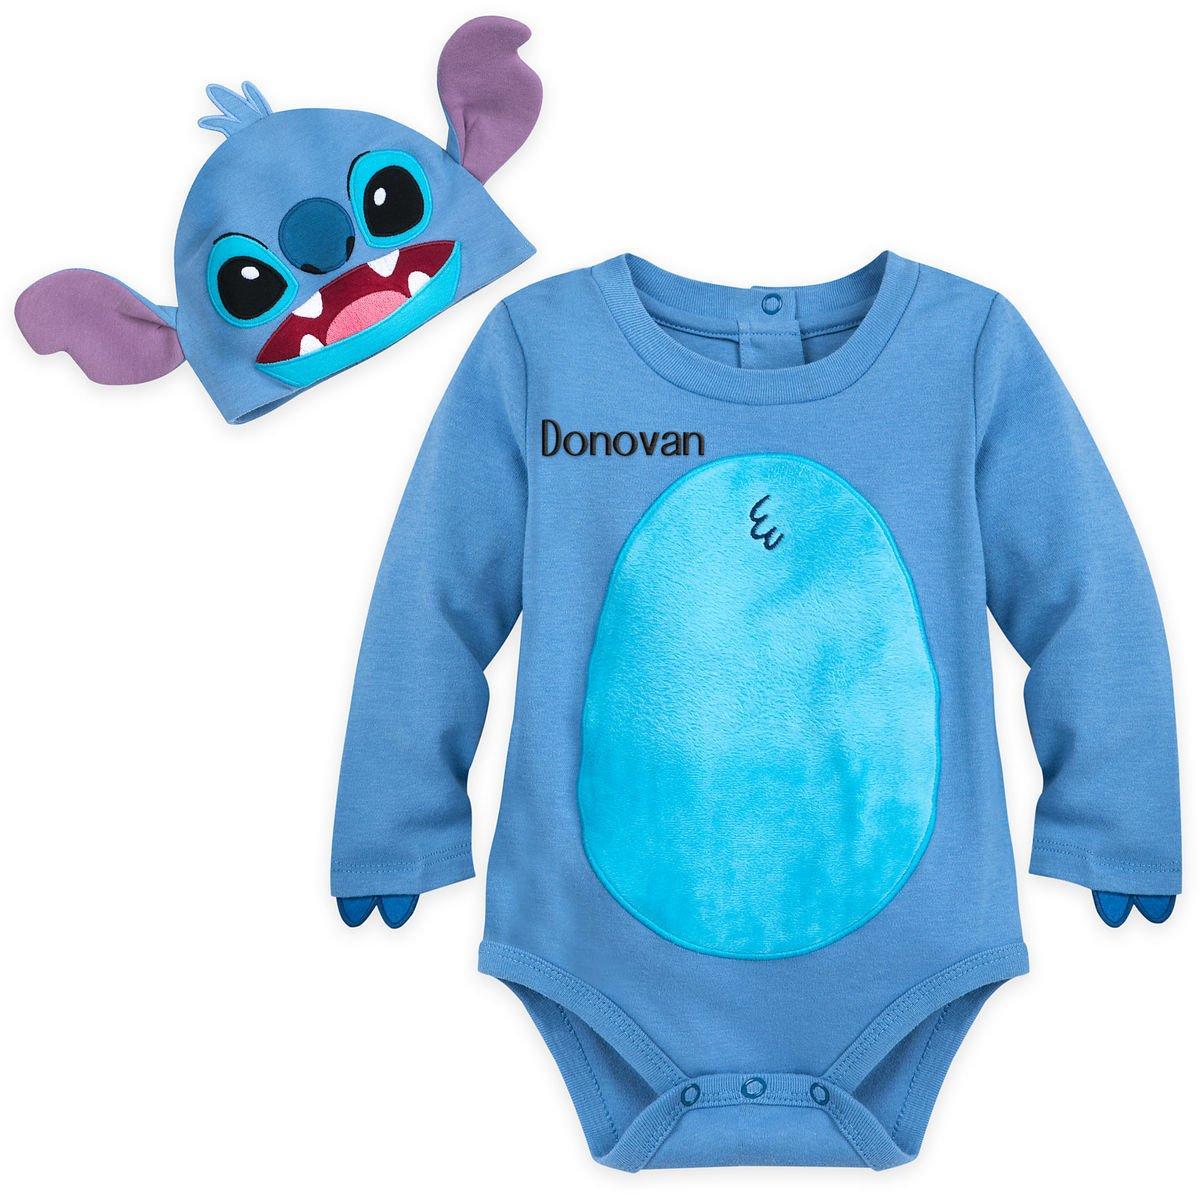 Disney Store Stitch Baby Costume Bodysuit Hat Lilo and Stitch 6-9 Months 2018 New